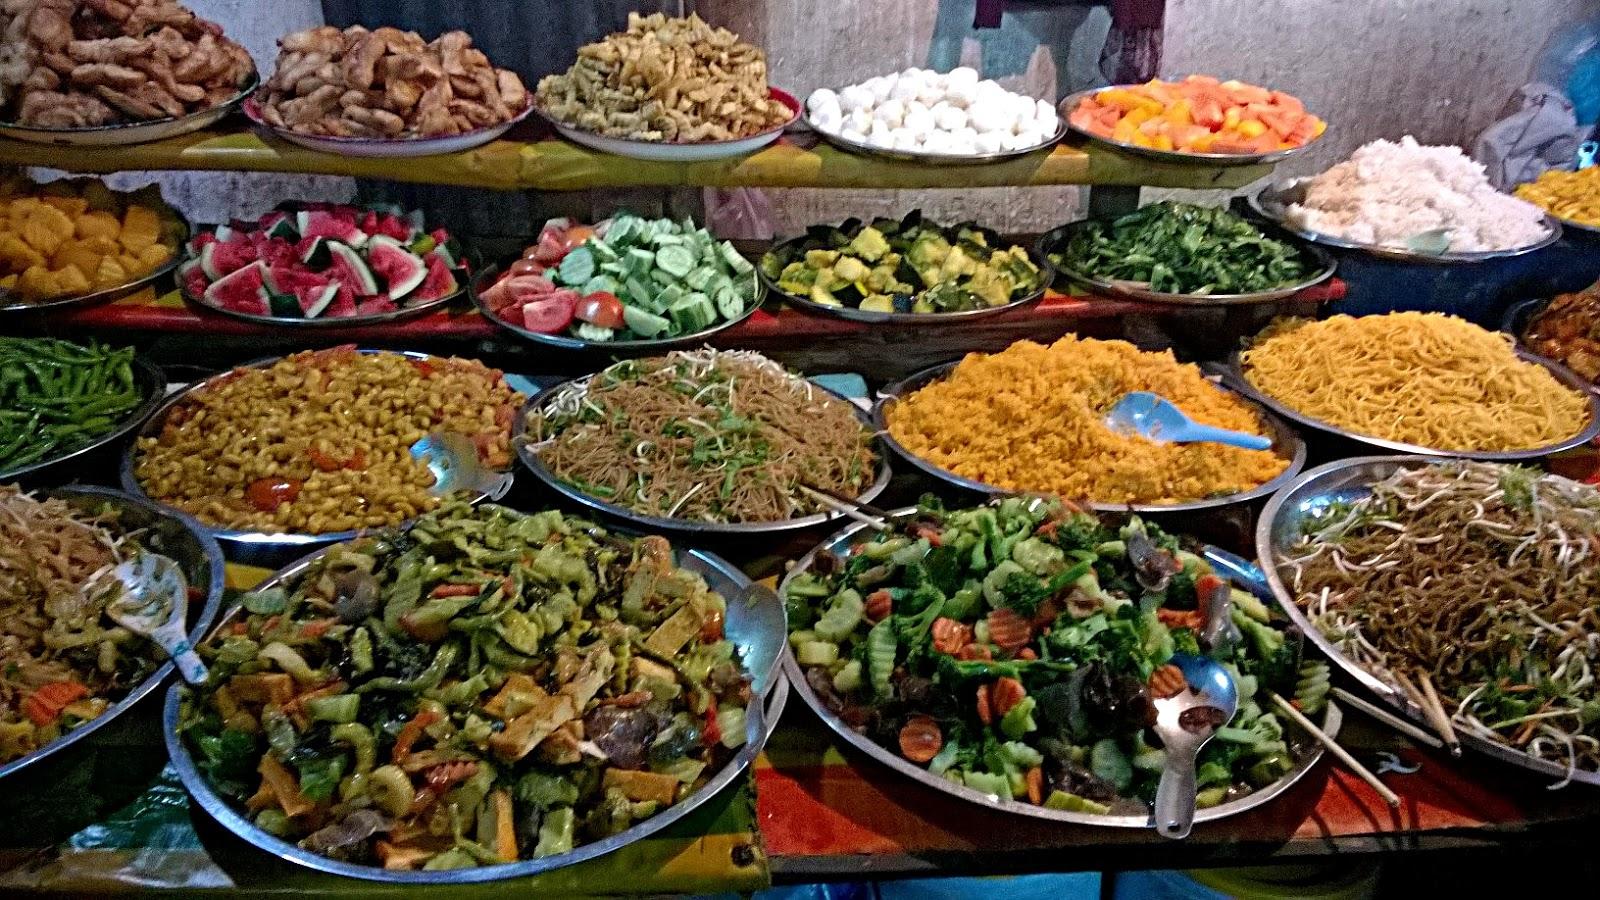 Laotische Küche | Kambodscha Laos Kambodschanische Laotische Kuche Explore The